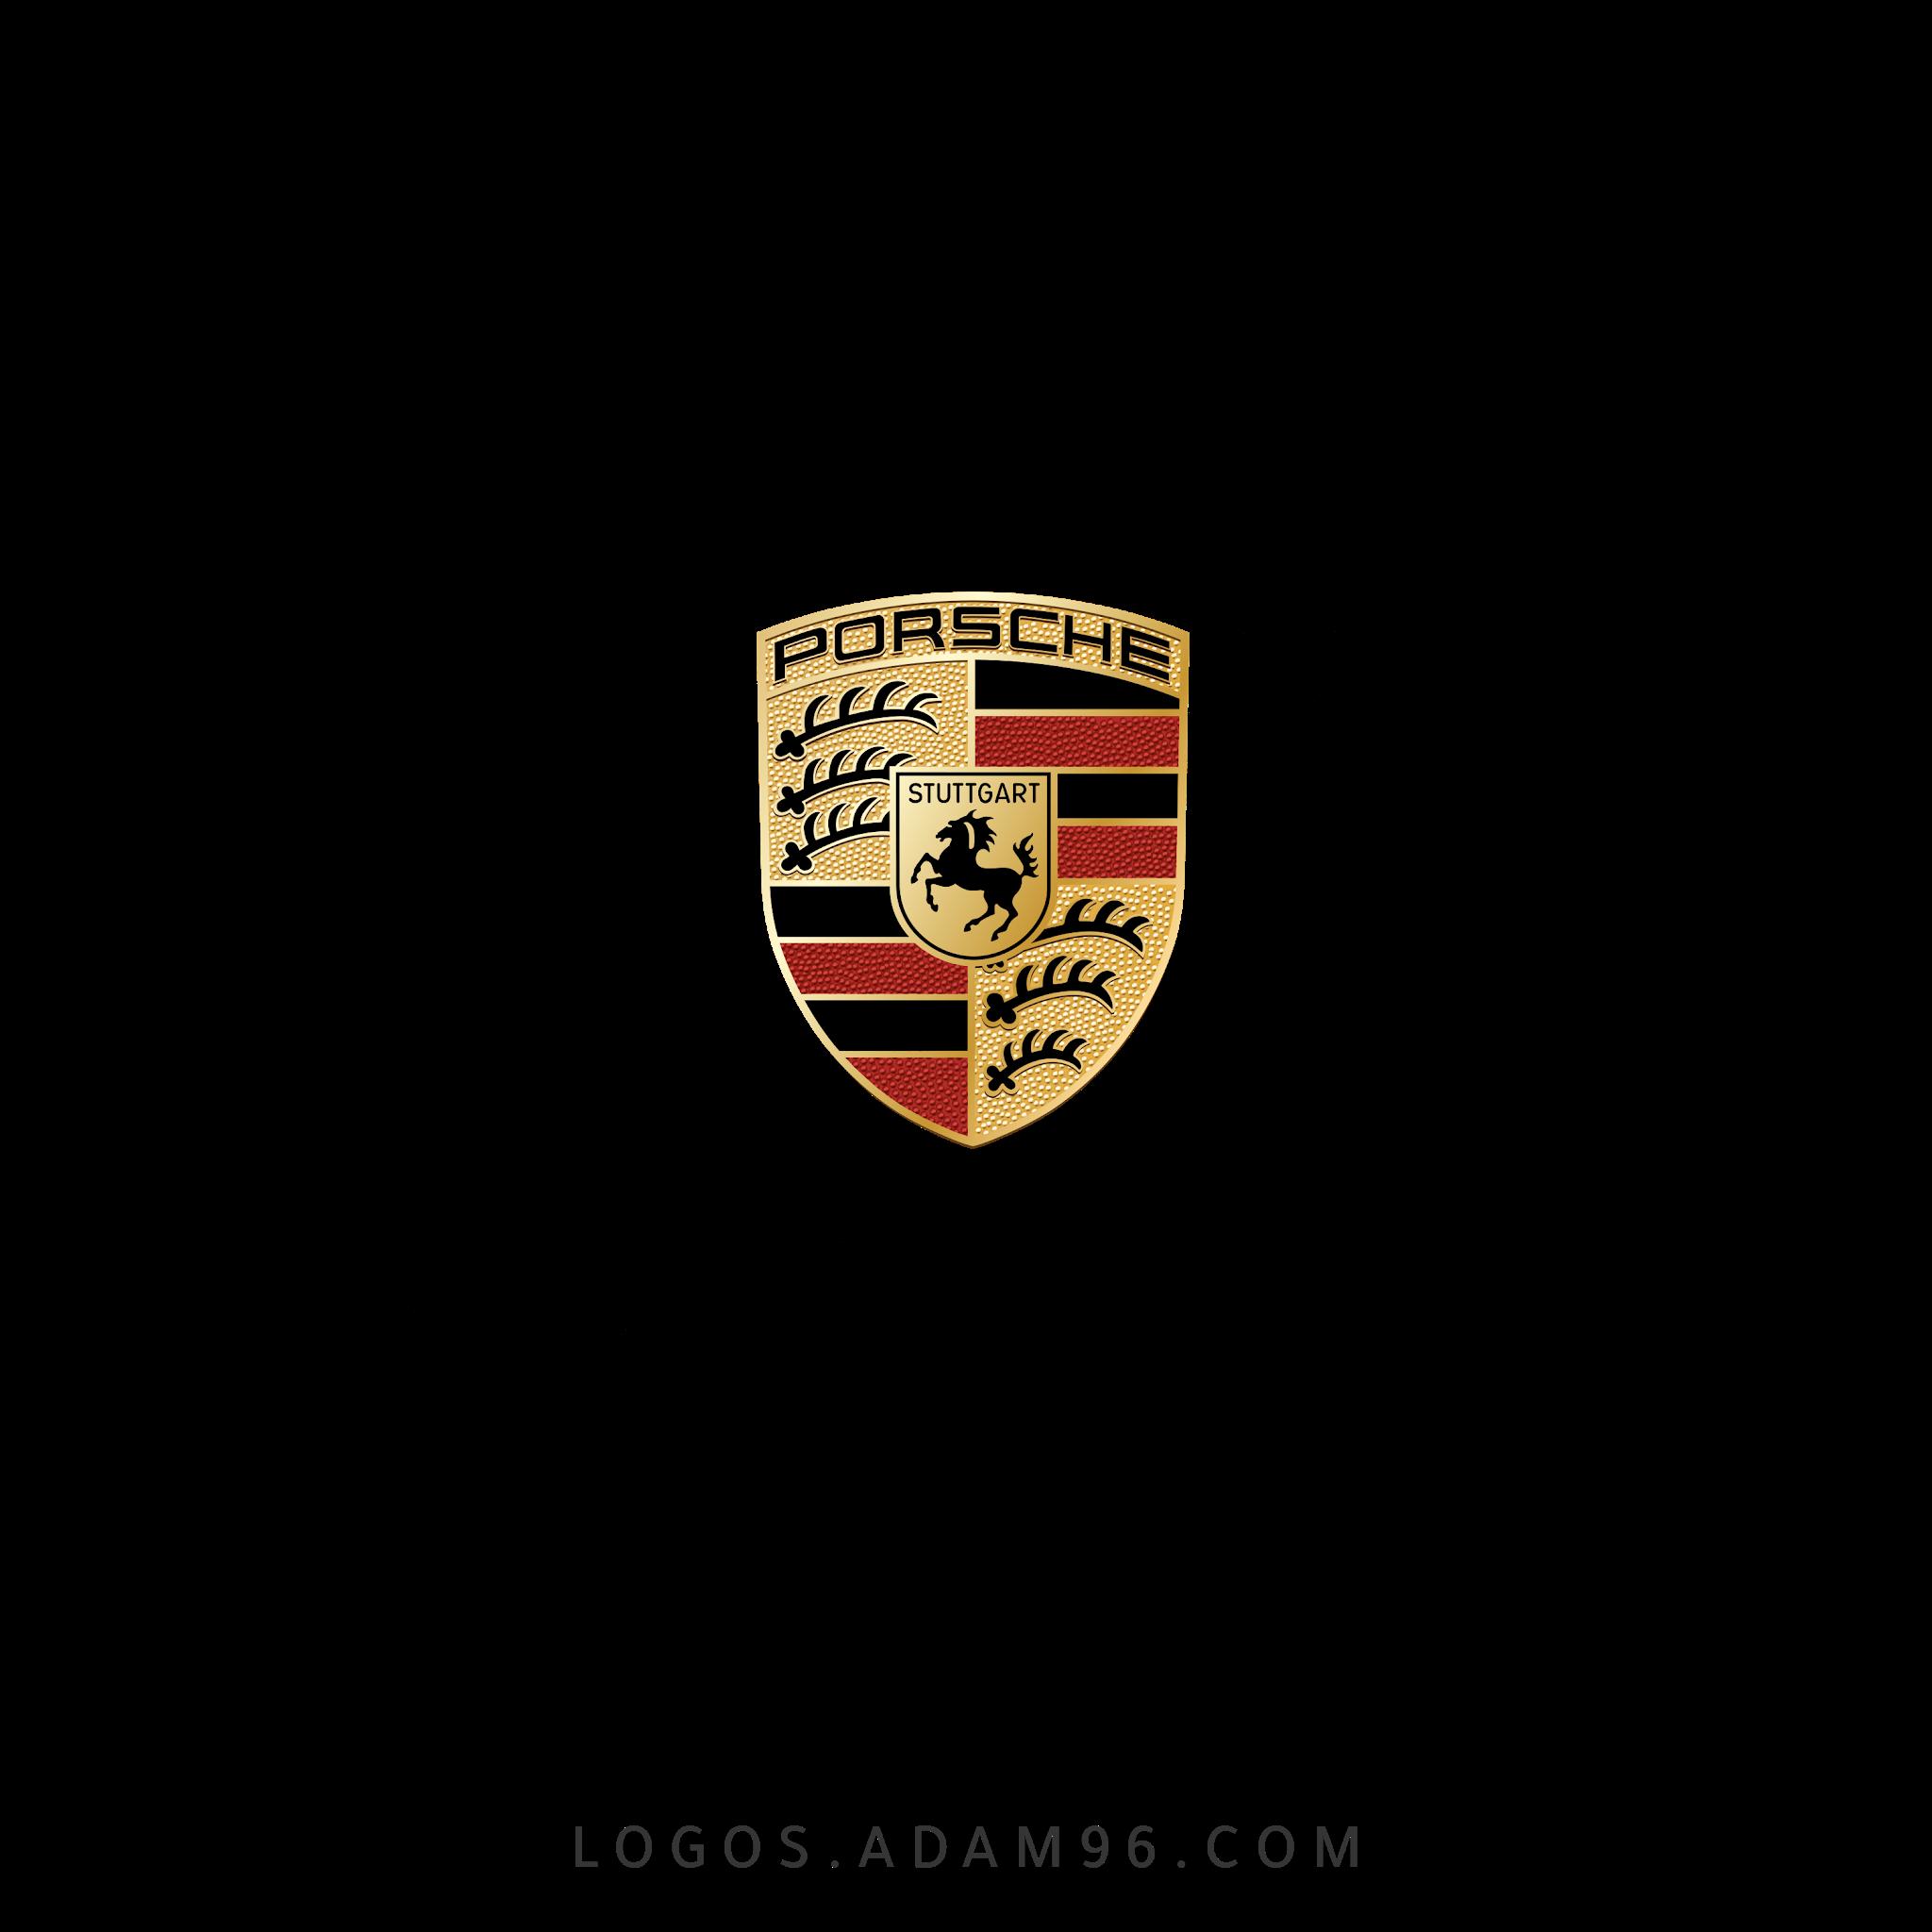 Download Logo Porsche PNG - Free Vector